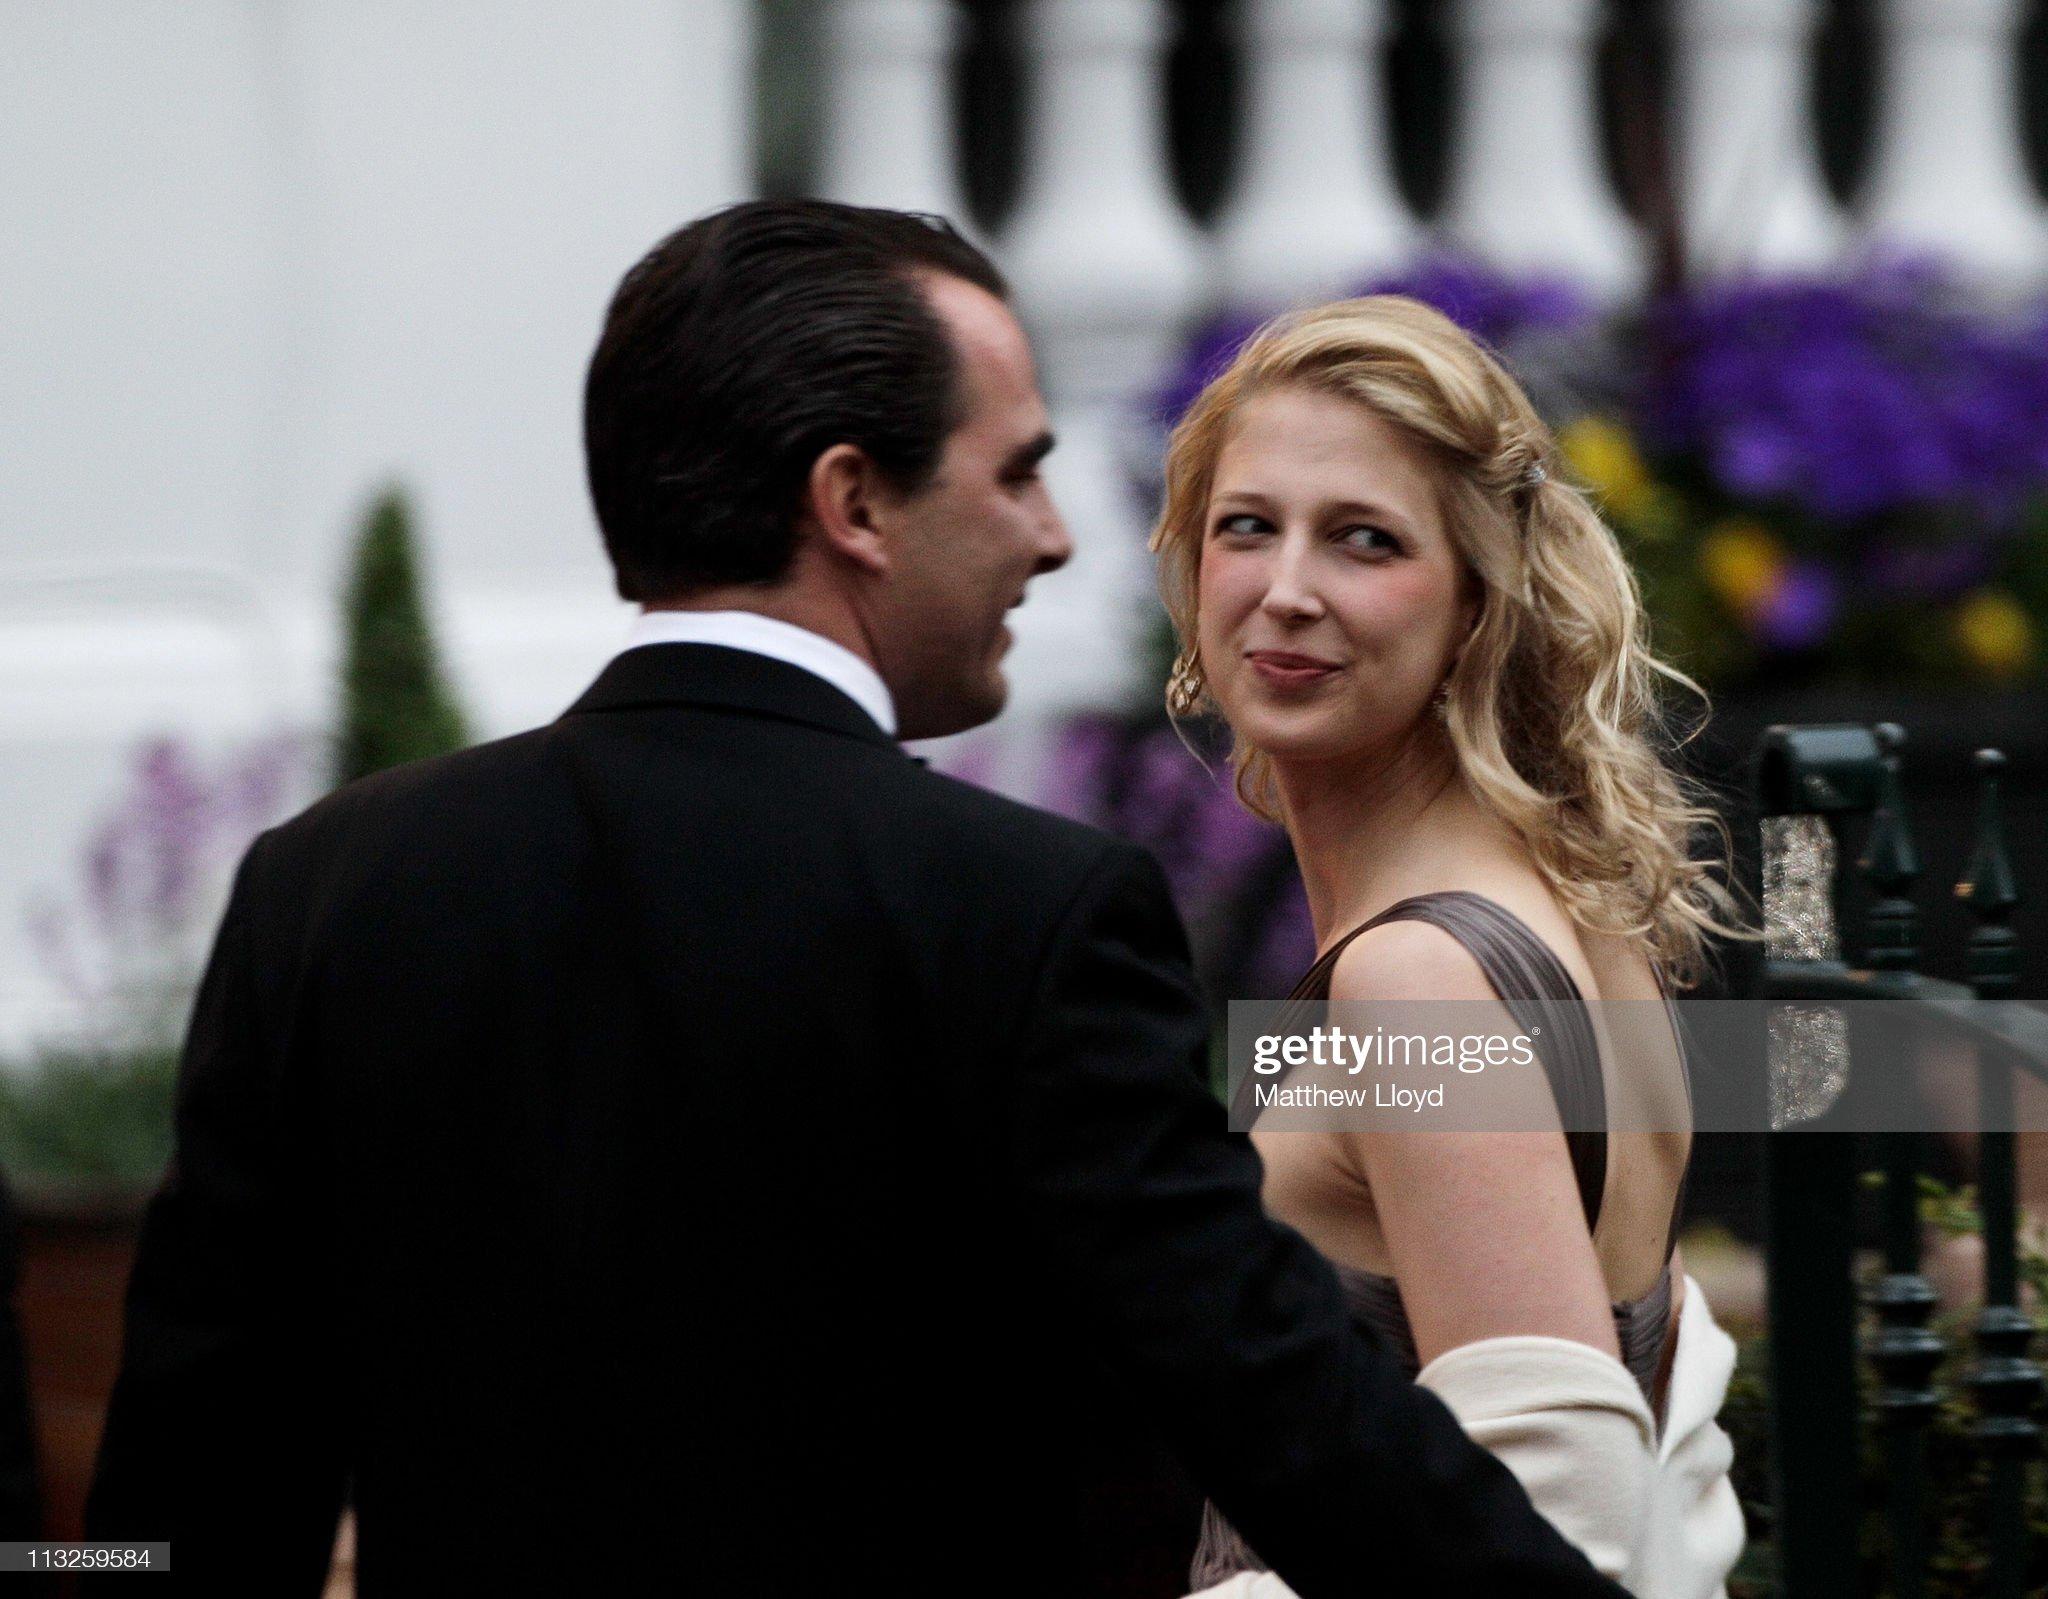 Royal Wedding - Pre-Wedding Dinner : News Photo